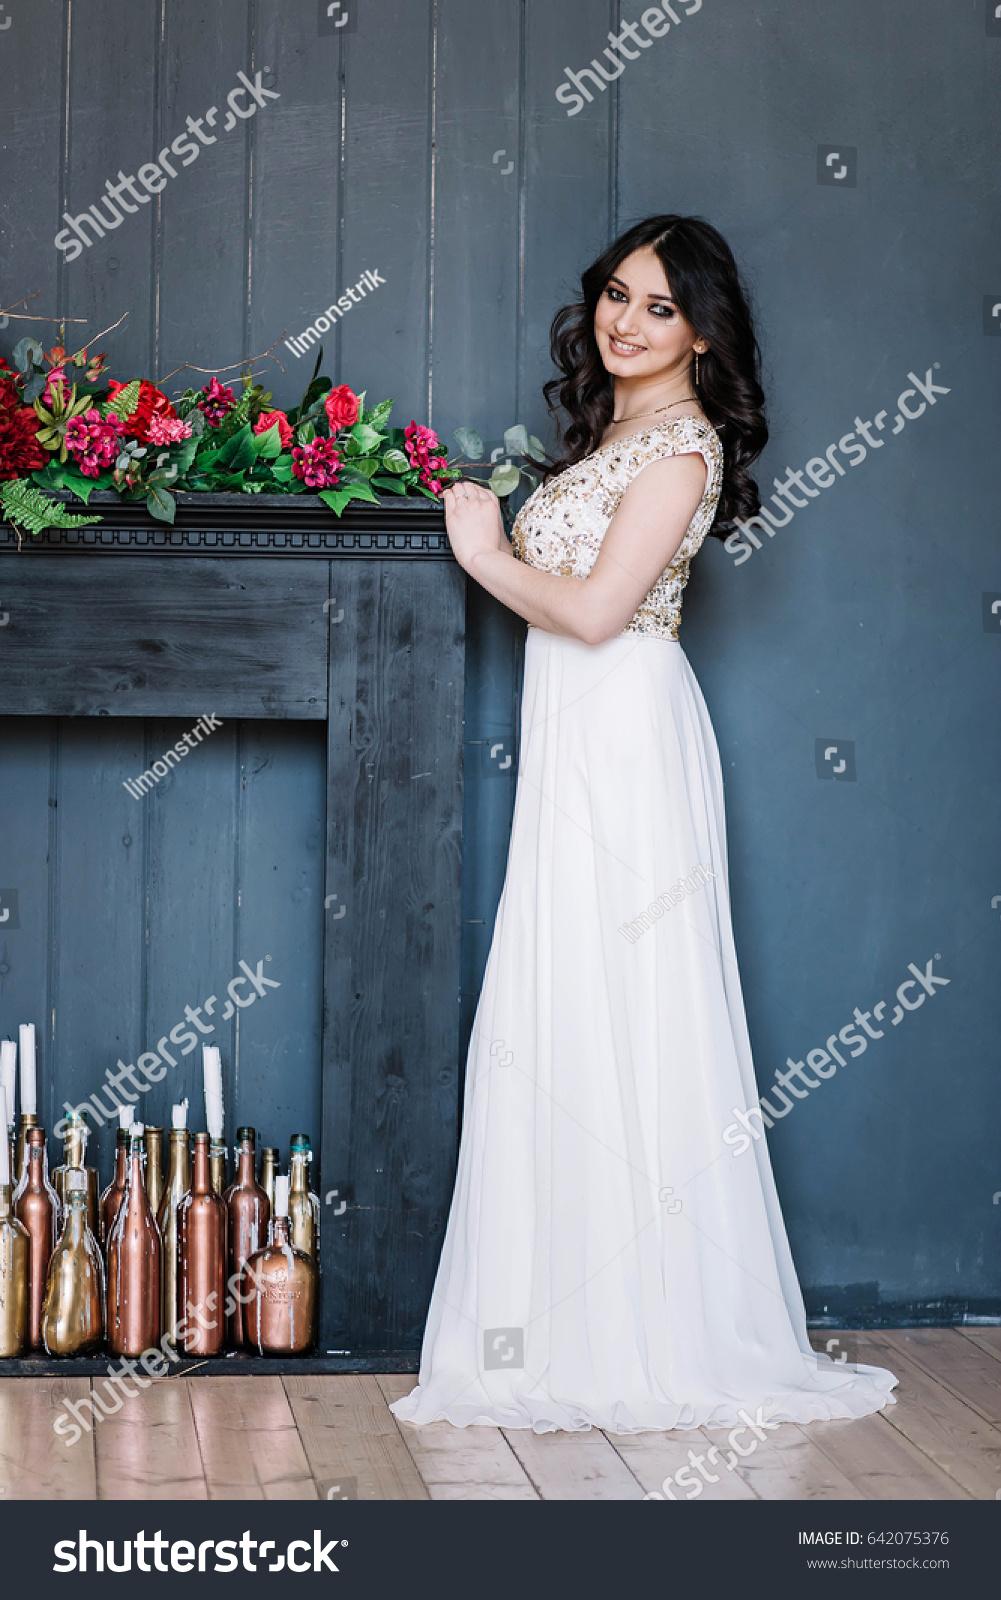 Beautiful Brunette Girl White Wedding Dress Stock Photo (Royalty ...